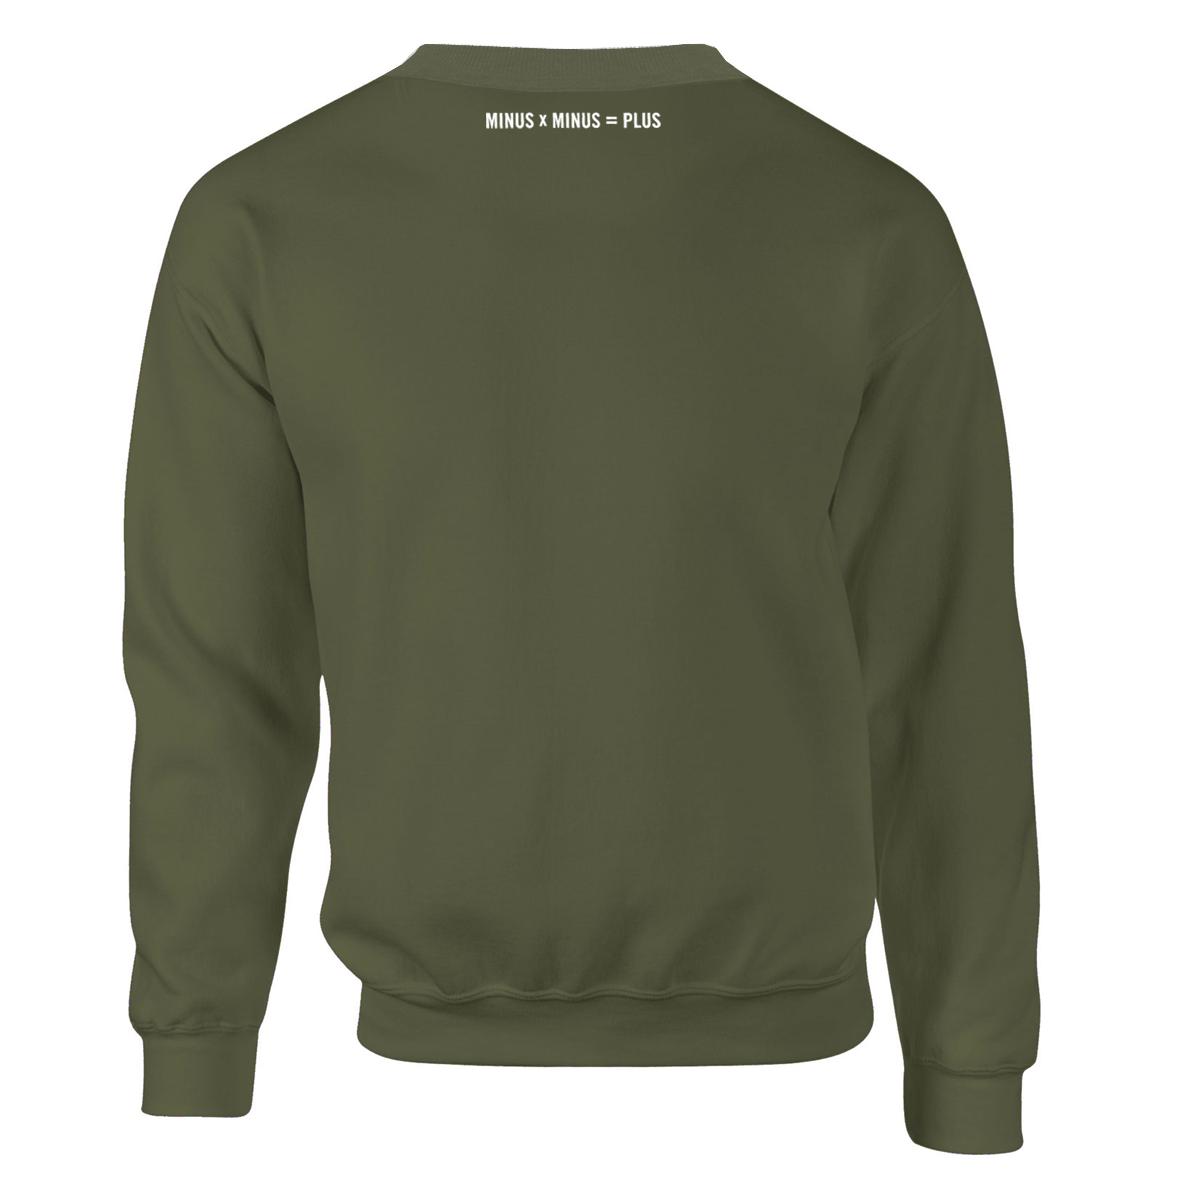 Disarstar Minus Sweater Sweater olive